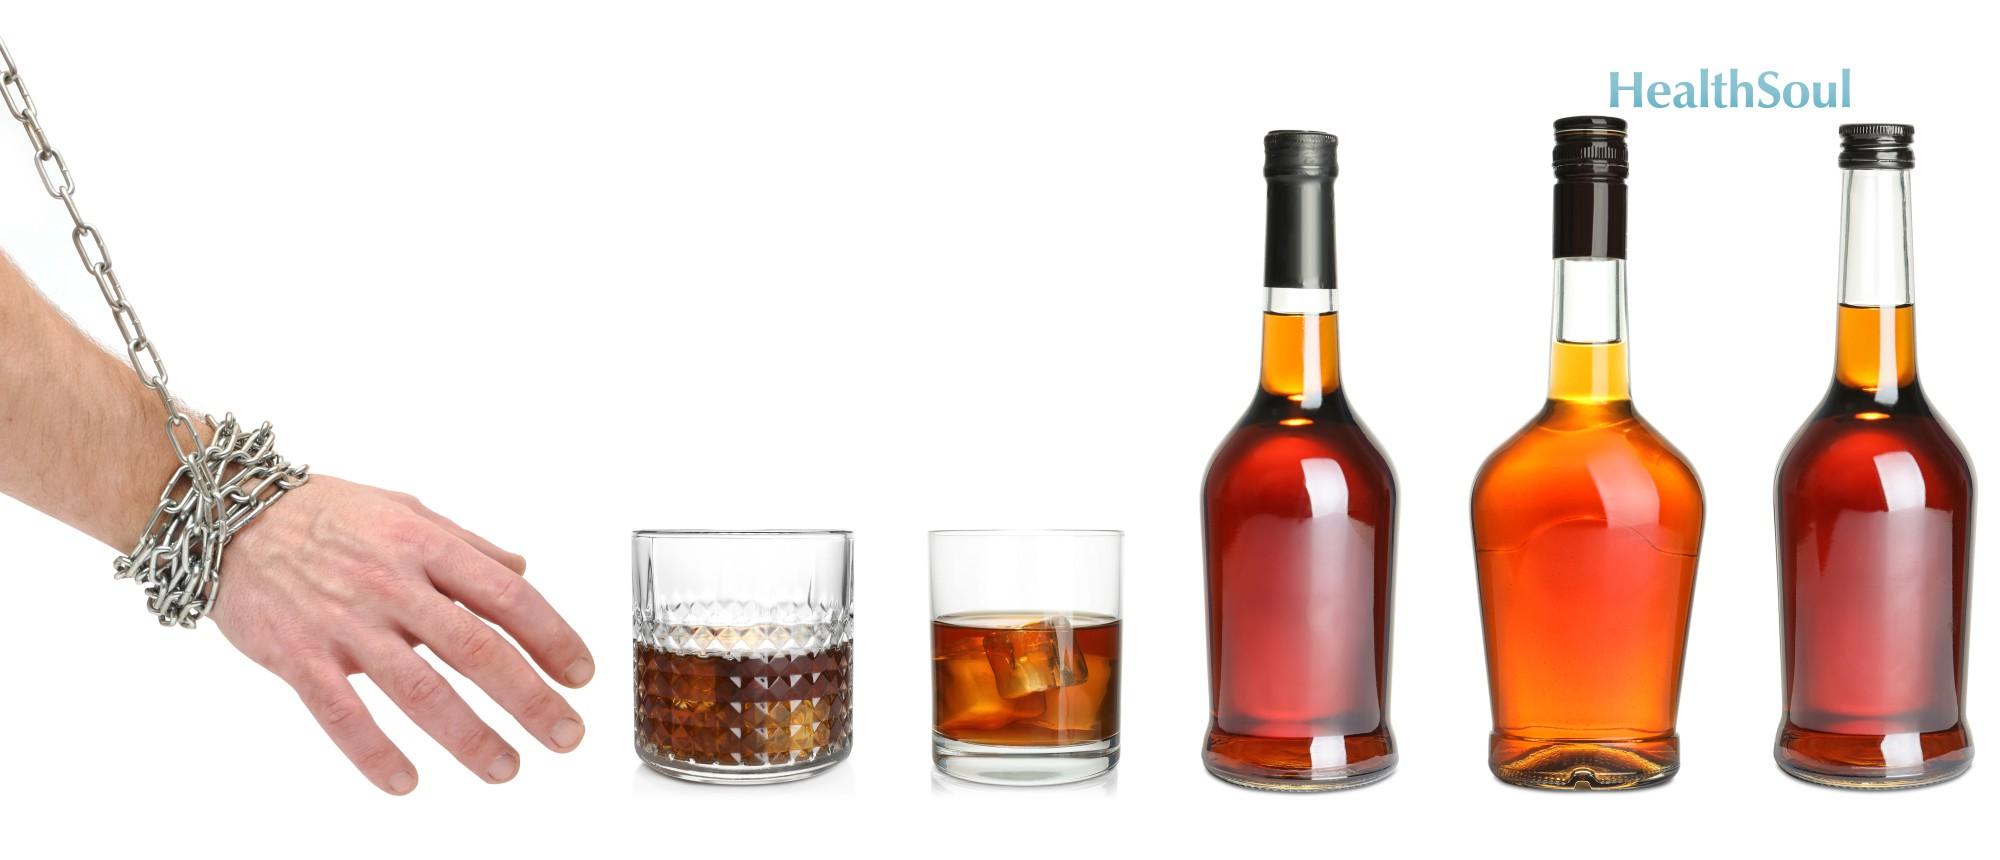 Three Ways to Cut Down on Drinking